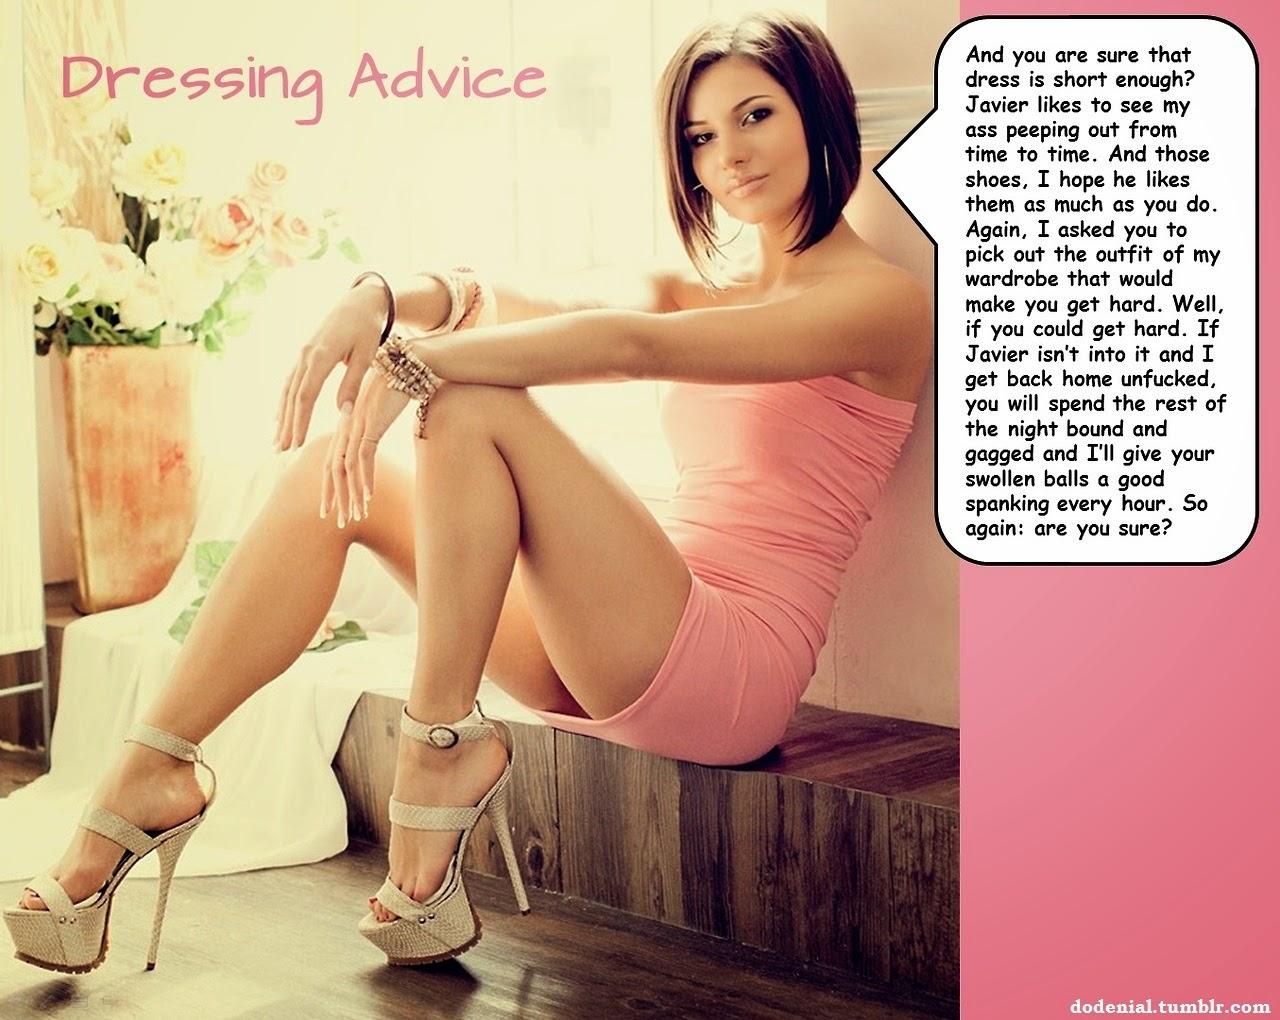 Femdom bdsm advice